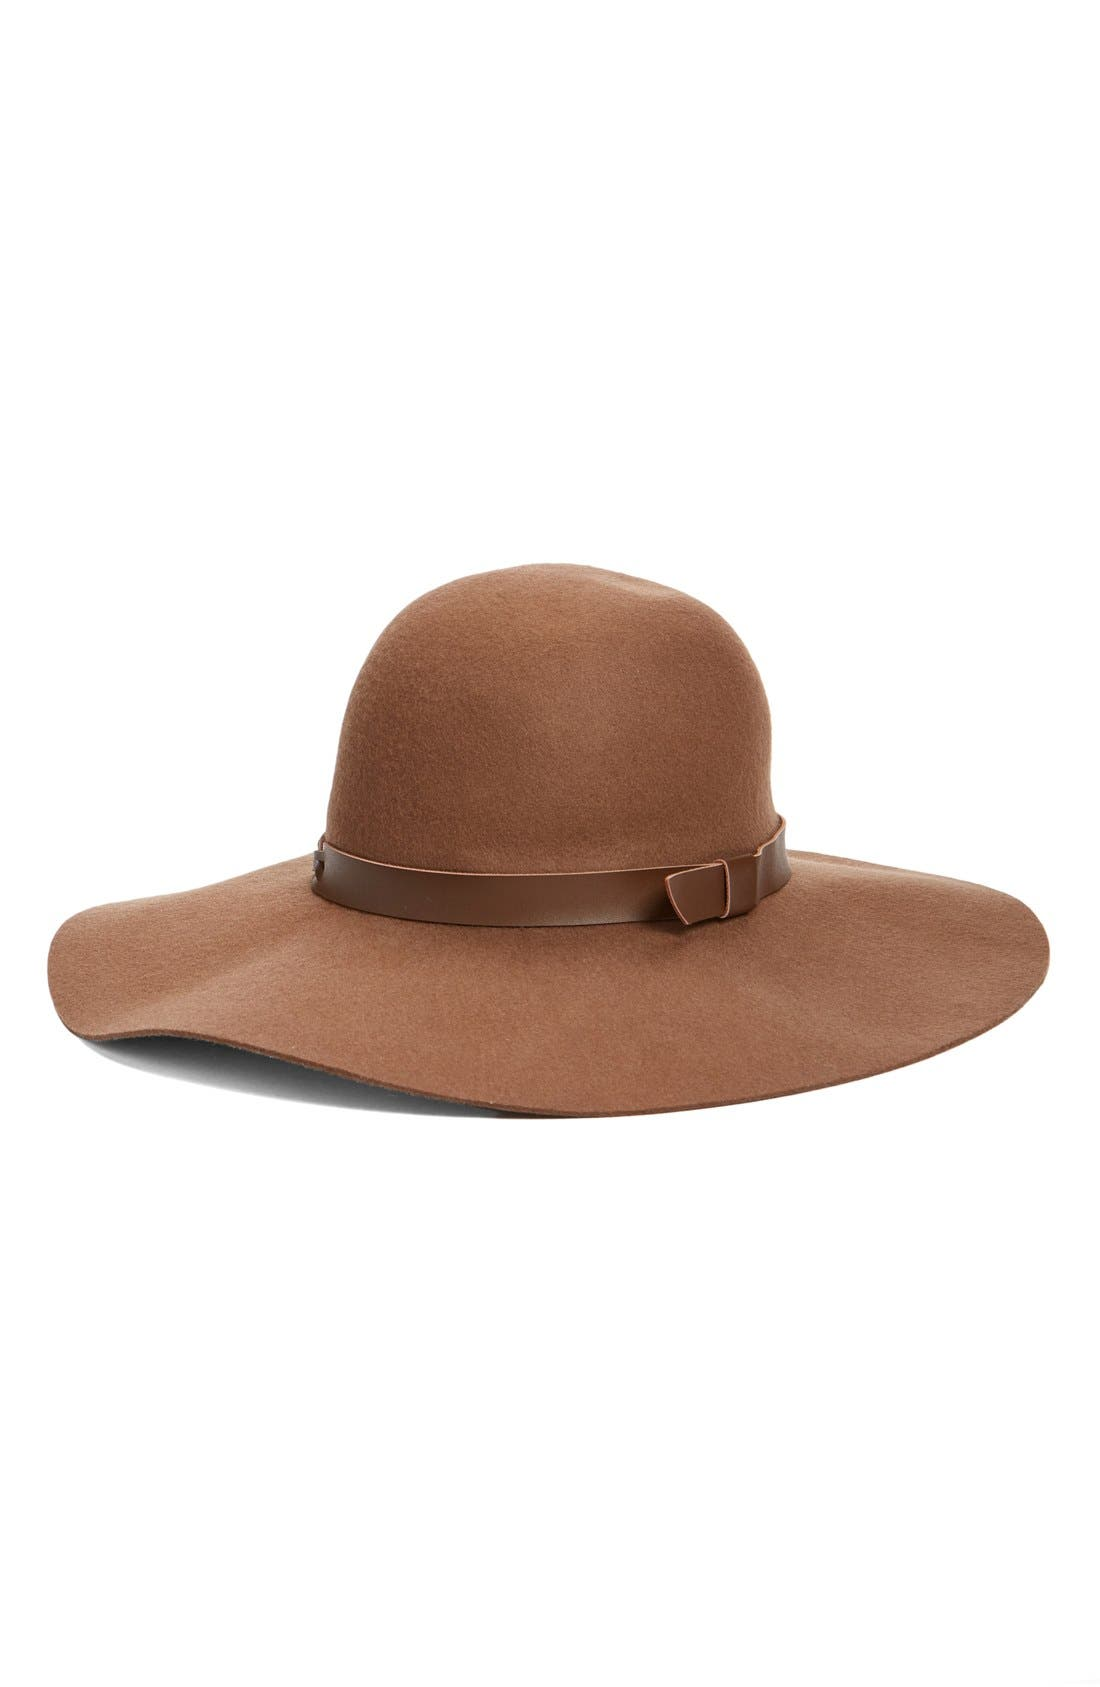 Main Image - Hinge Floppy Wool Felt Hat